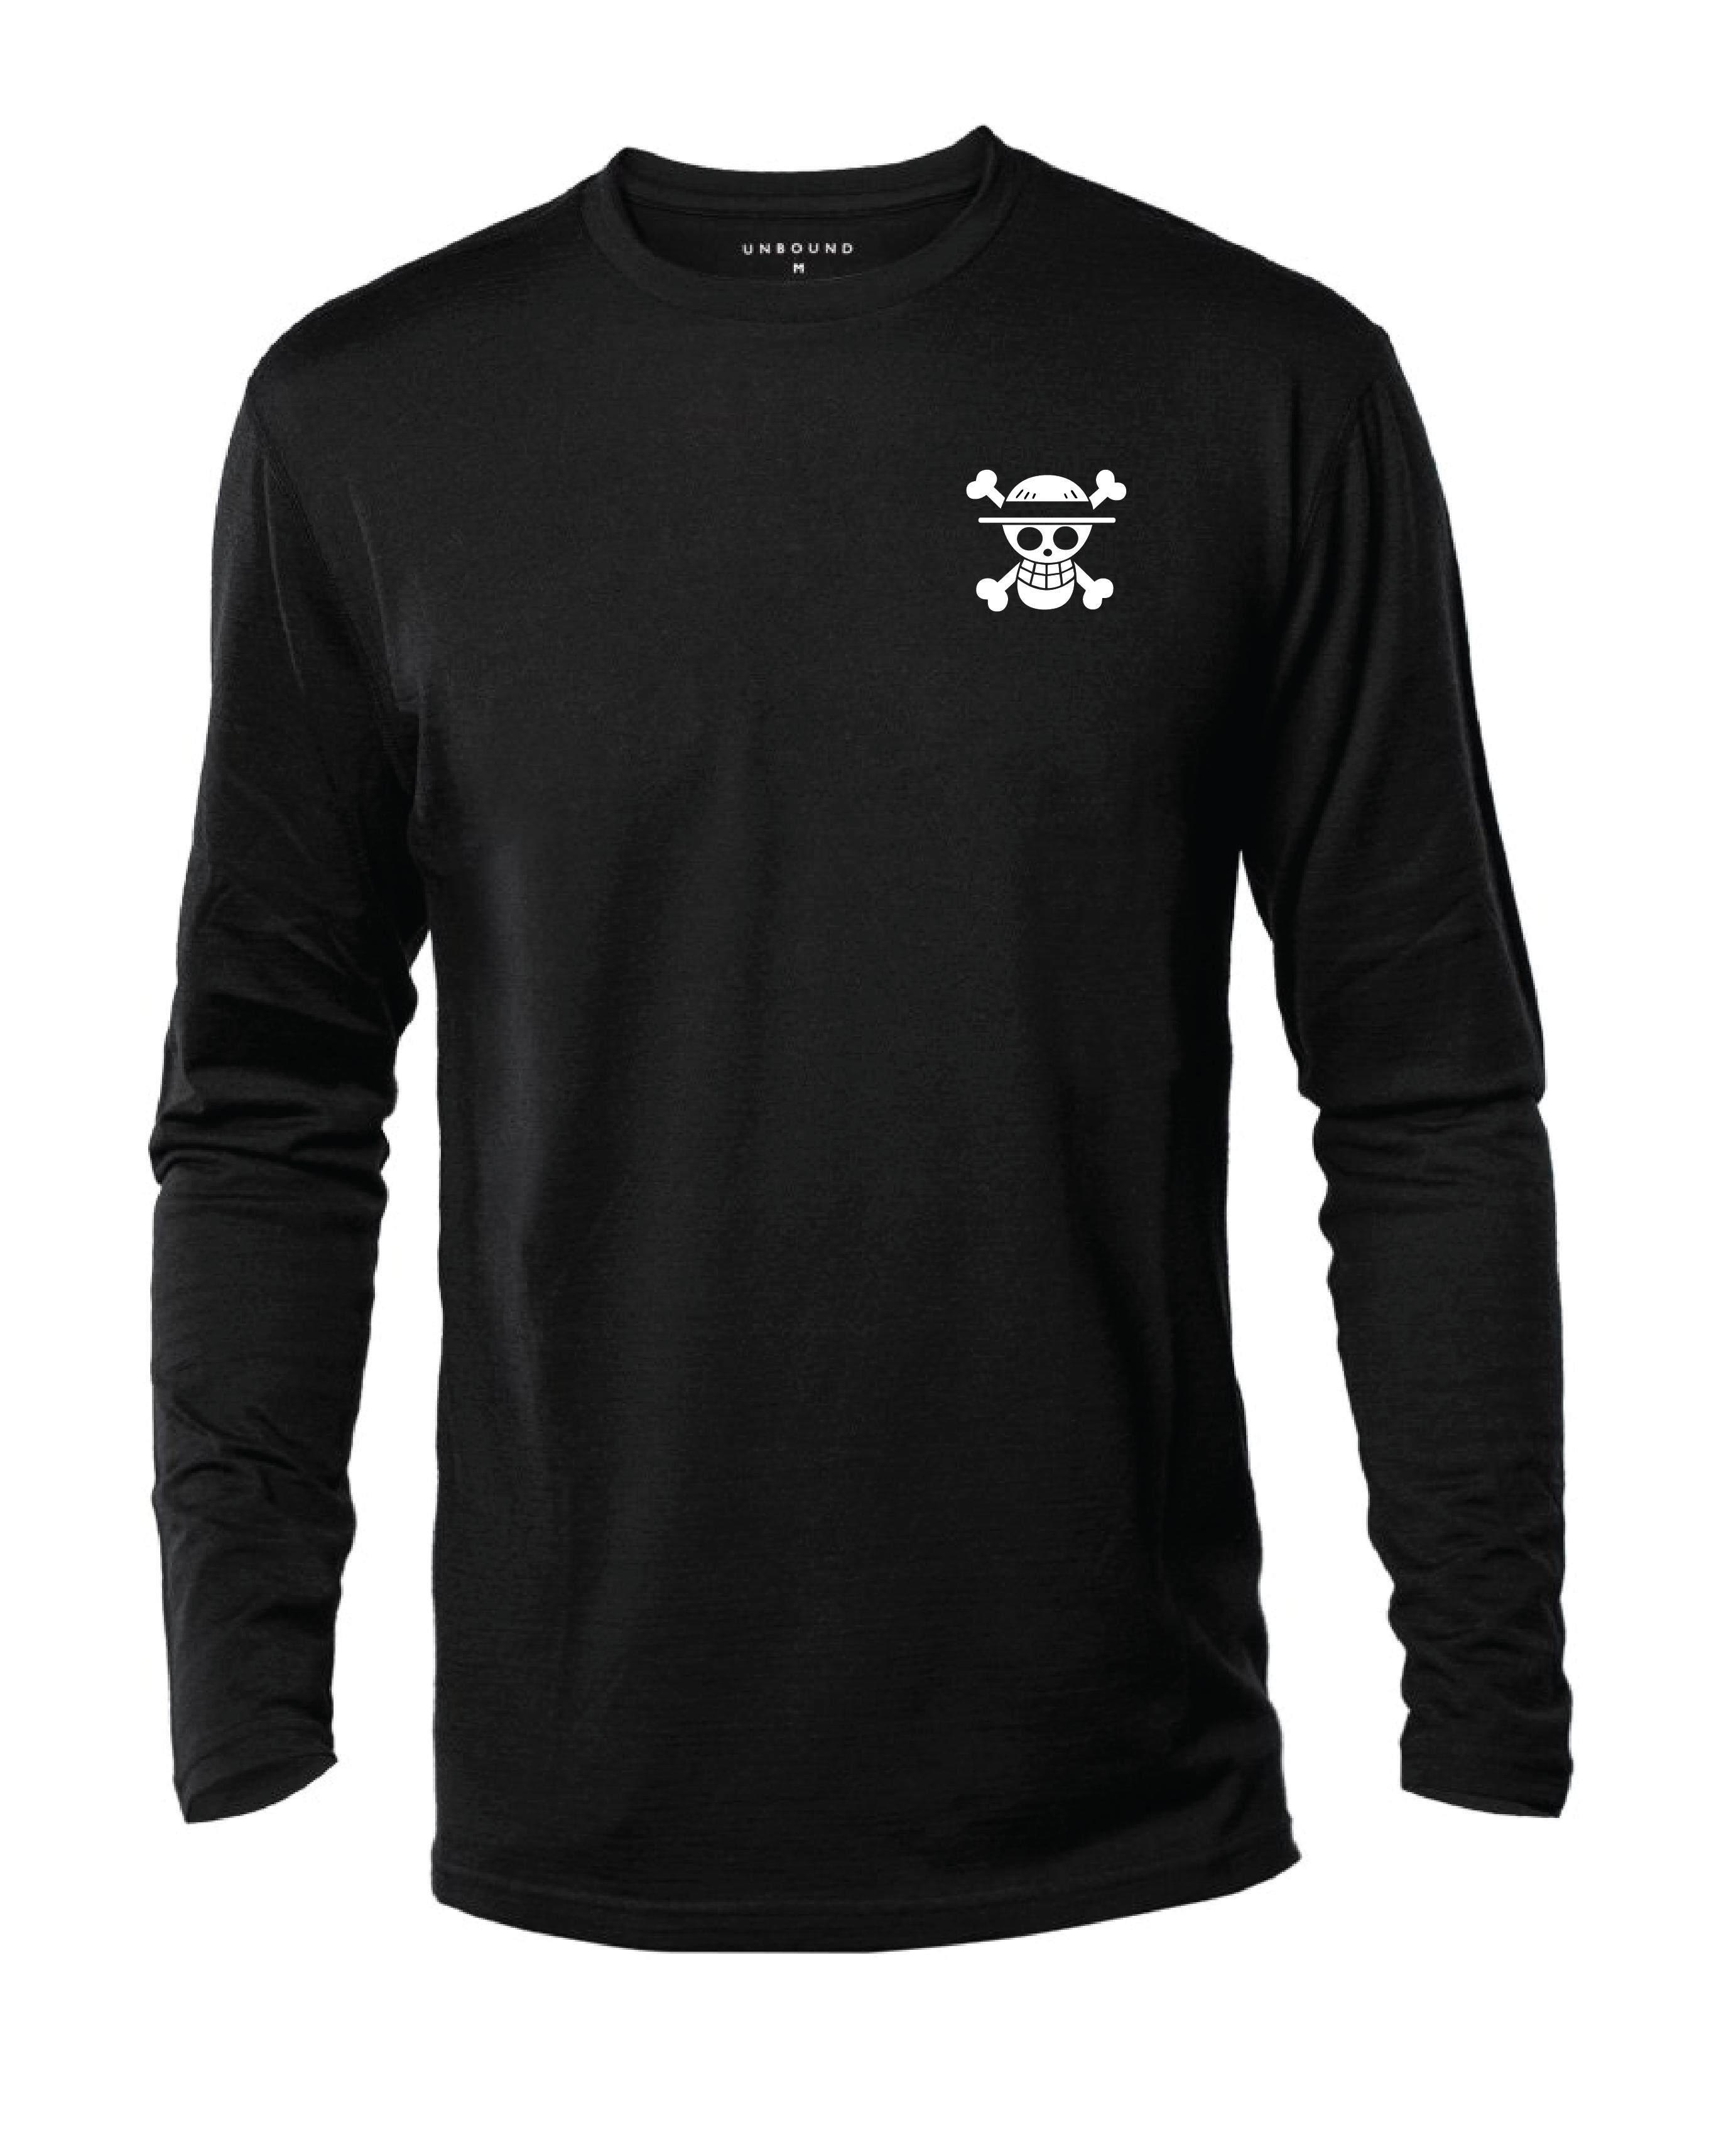 T-Shirt ONE PIECE Left Logo Lengan Panjang 100% Cotton Baju Tshirt Black White Hitam Putih Bossku